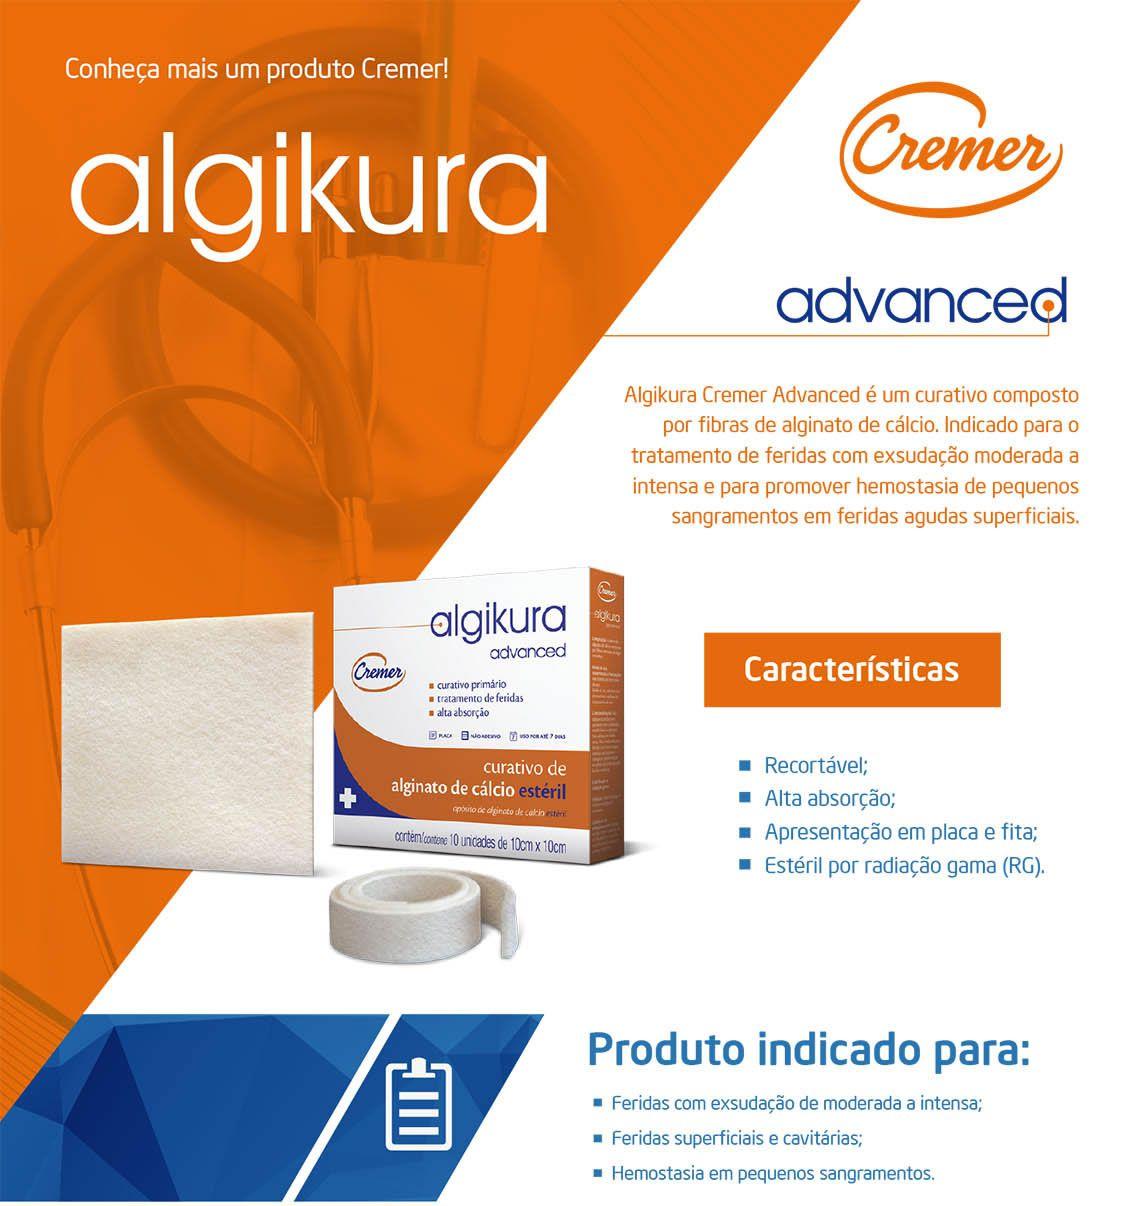 Curativo Alginato Cálcio Algikura 10x10cm CX C/ 10 Un. Cremer